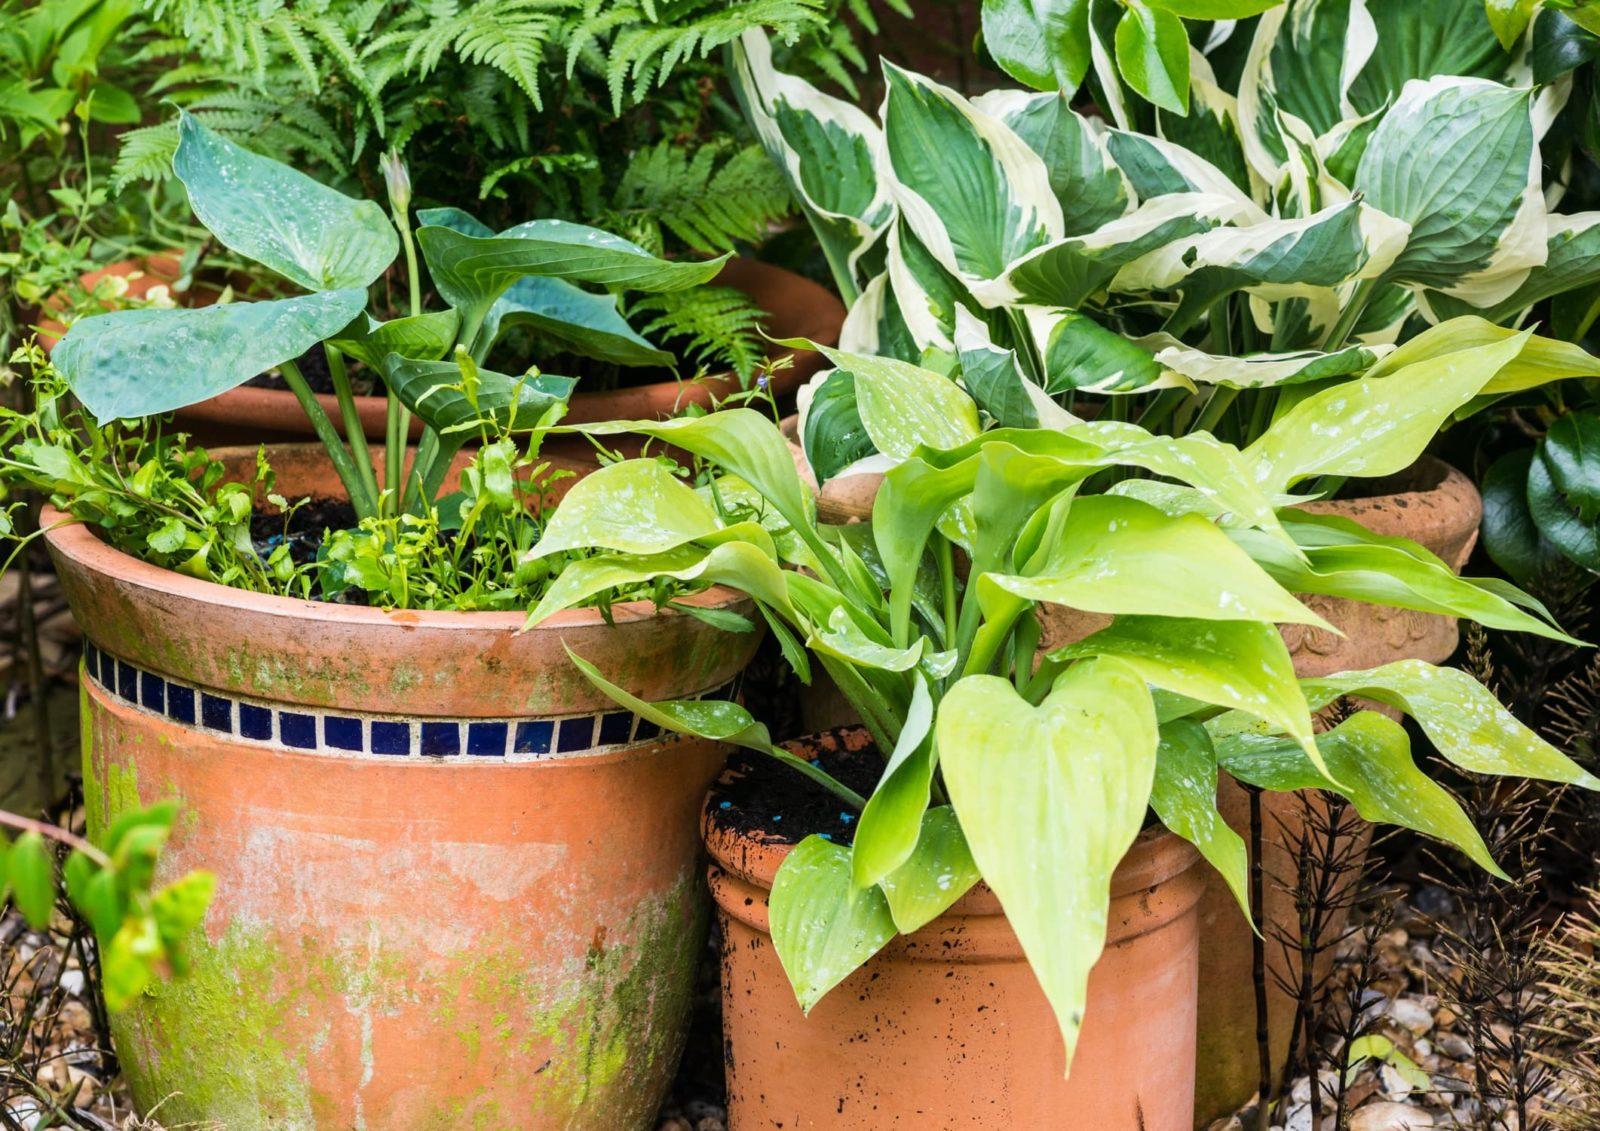 various hosta plants in terracotta pots